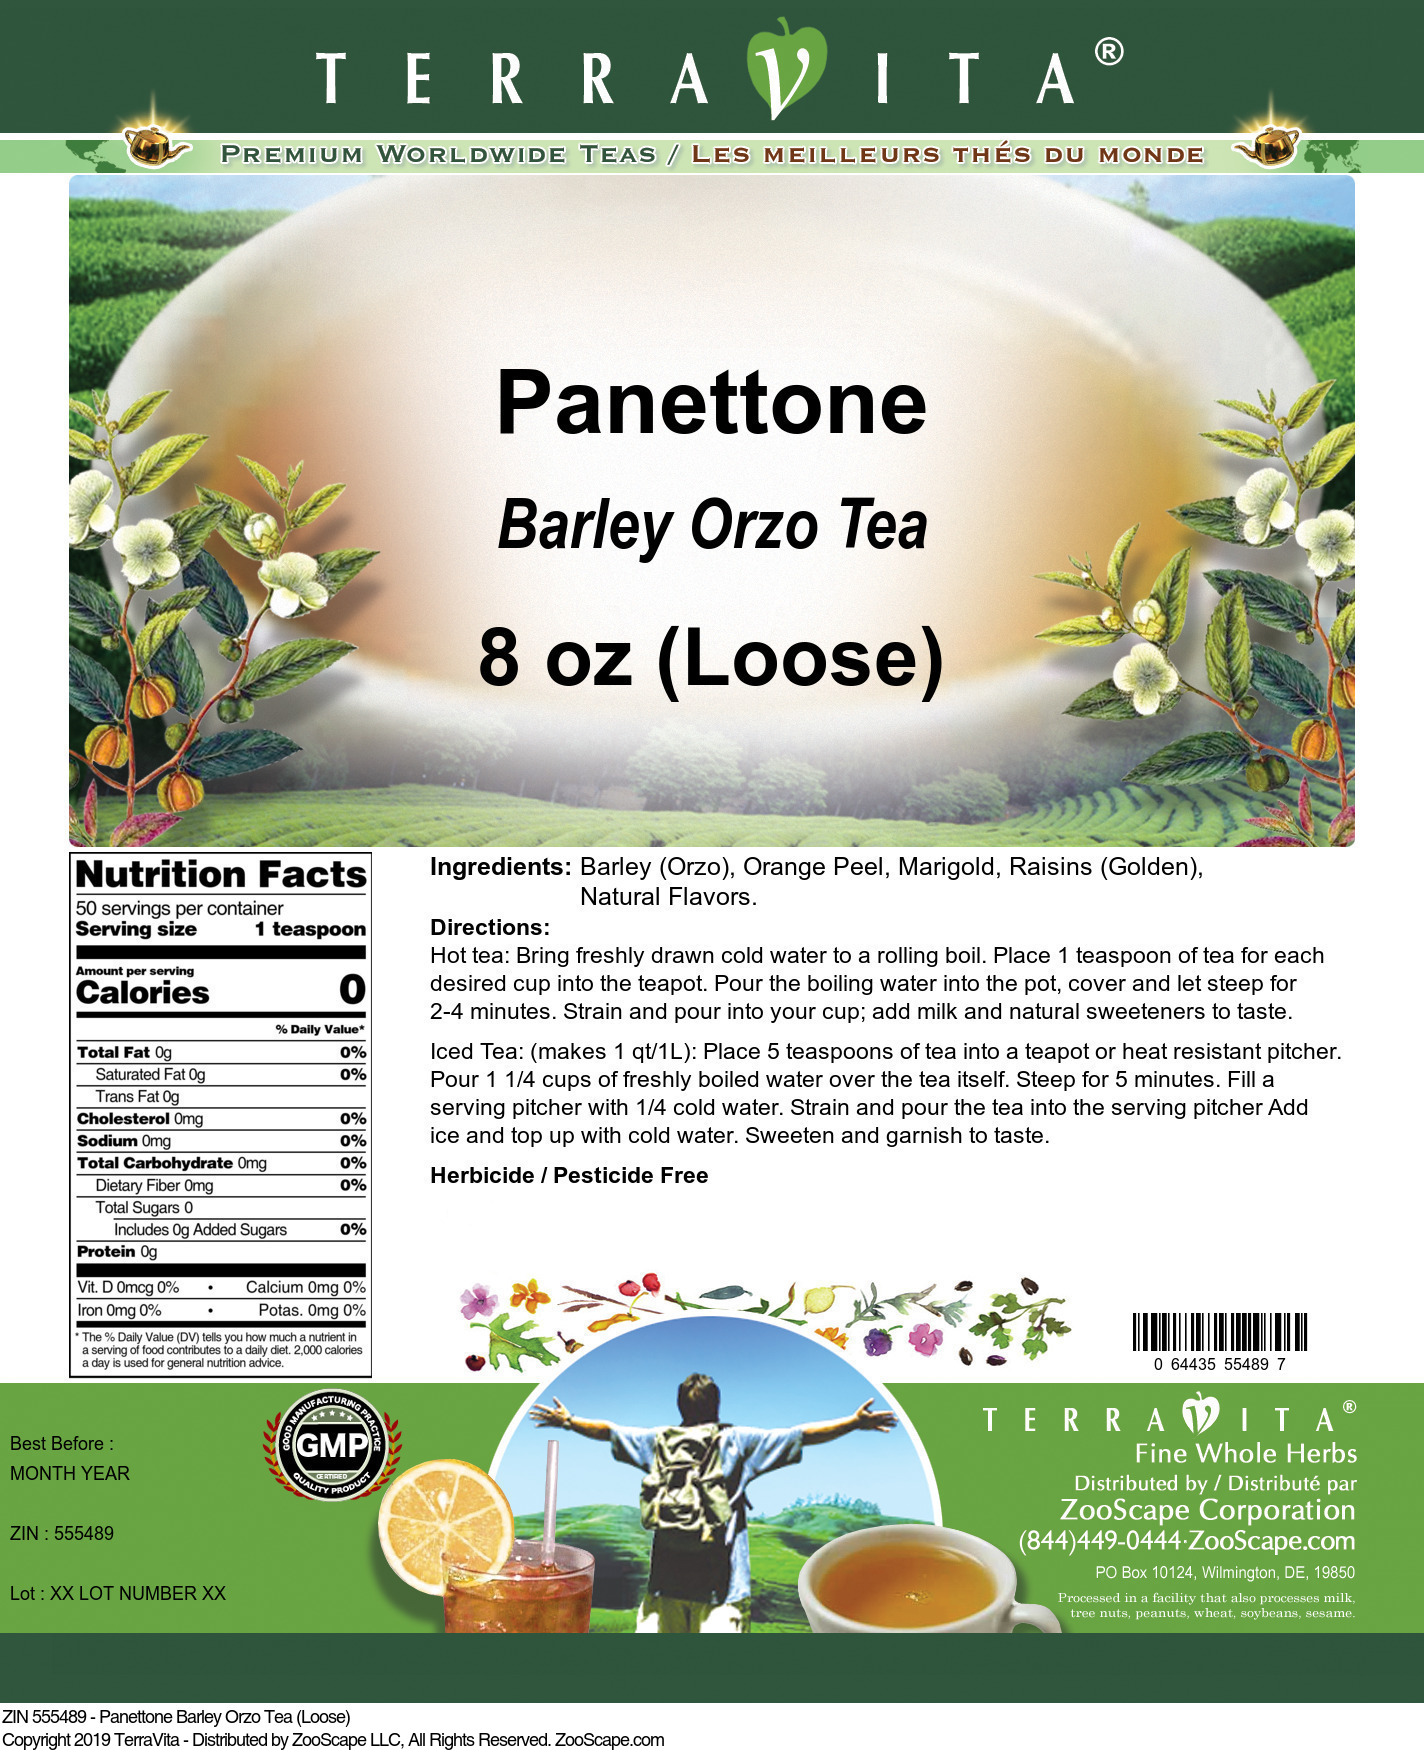 Panettone Barley Orzo Tea (Loose)